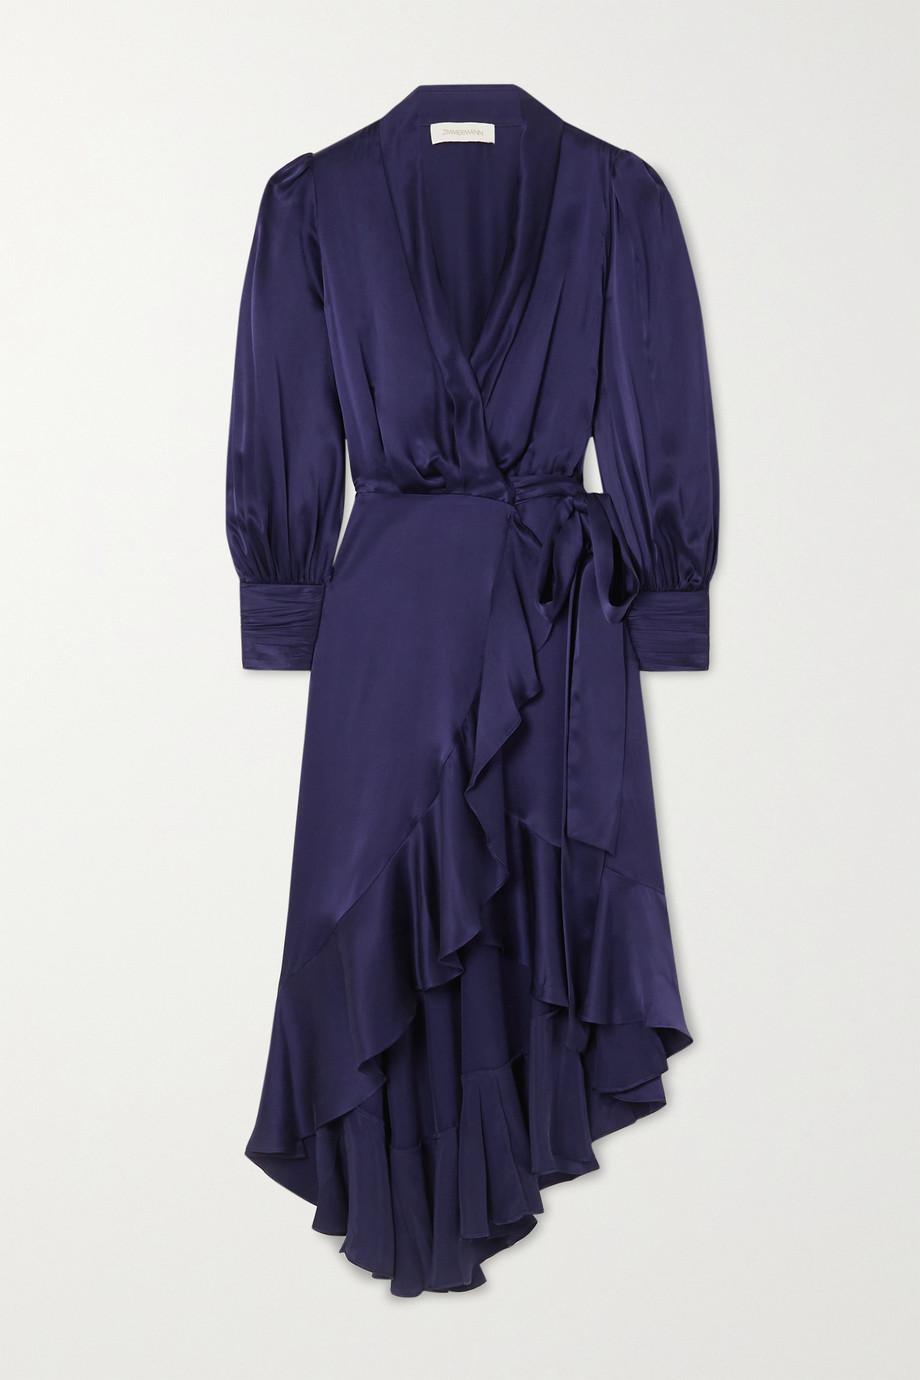 Zimmermann Asymmetric ruffled silk-satin wrap midi dress